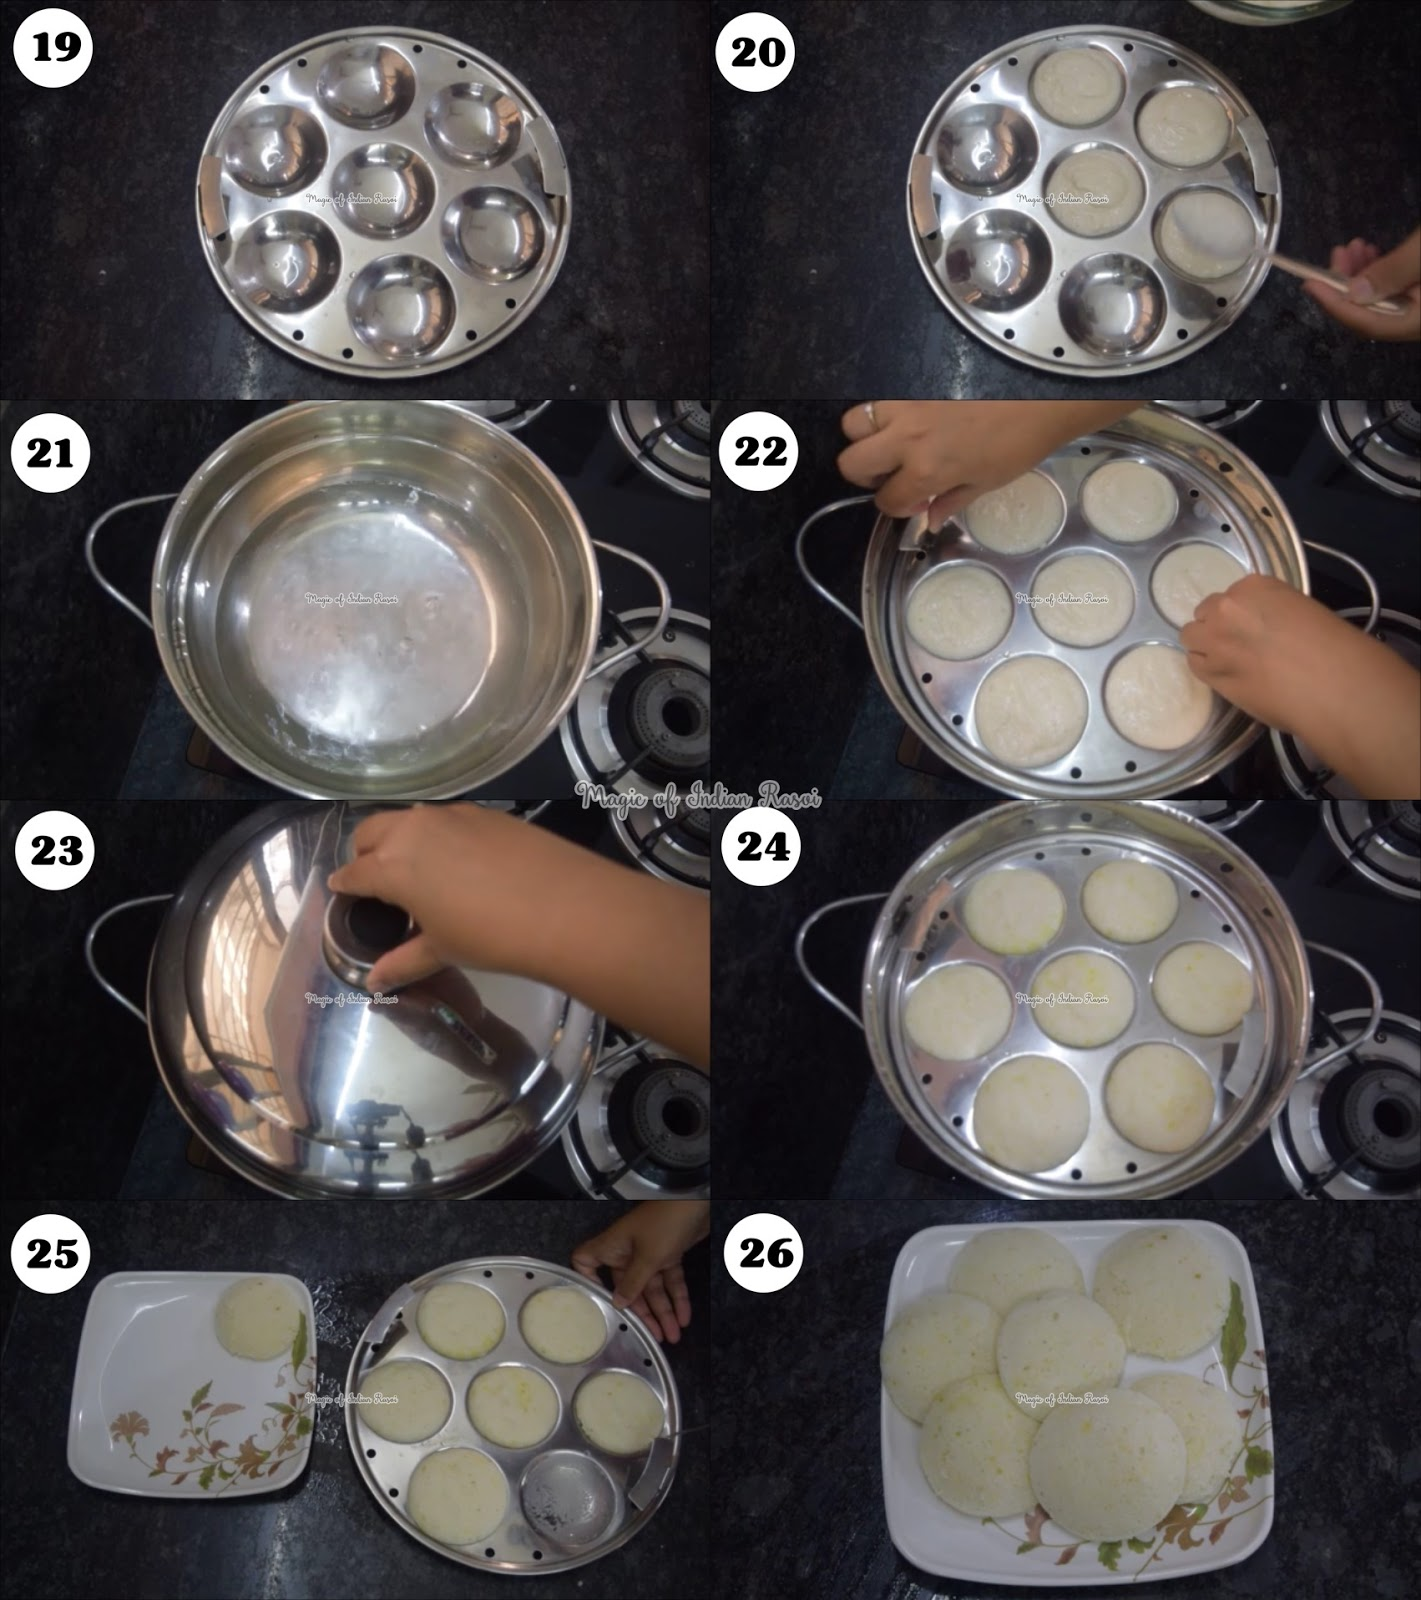 Instant Rice Idli Mix Recipe - साउथ इंडियन इडली प्रेमिक्स घर पर बनाये - Priya R - Magic of Indian Rasoi